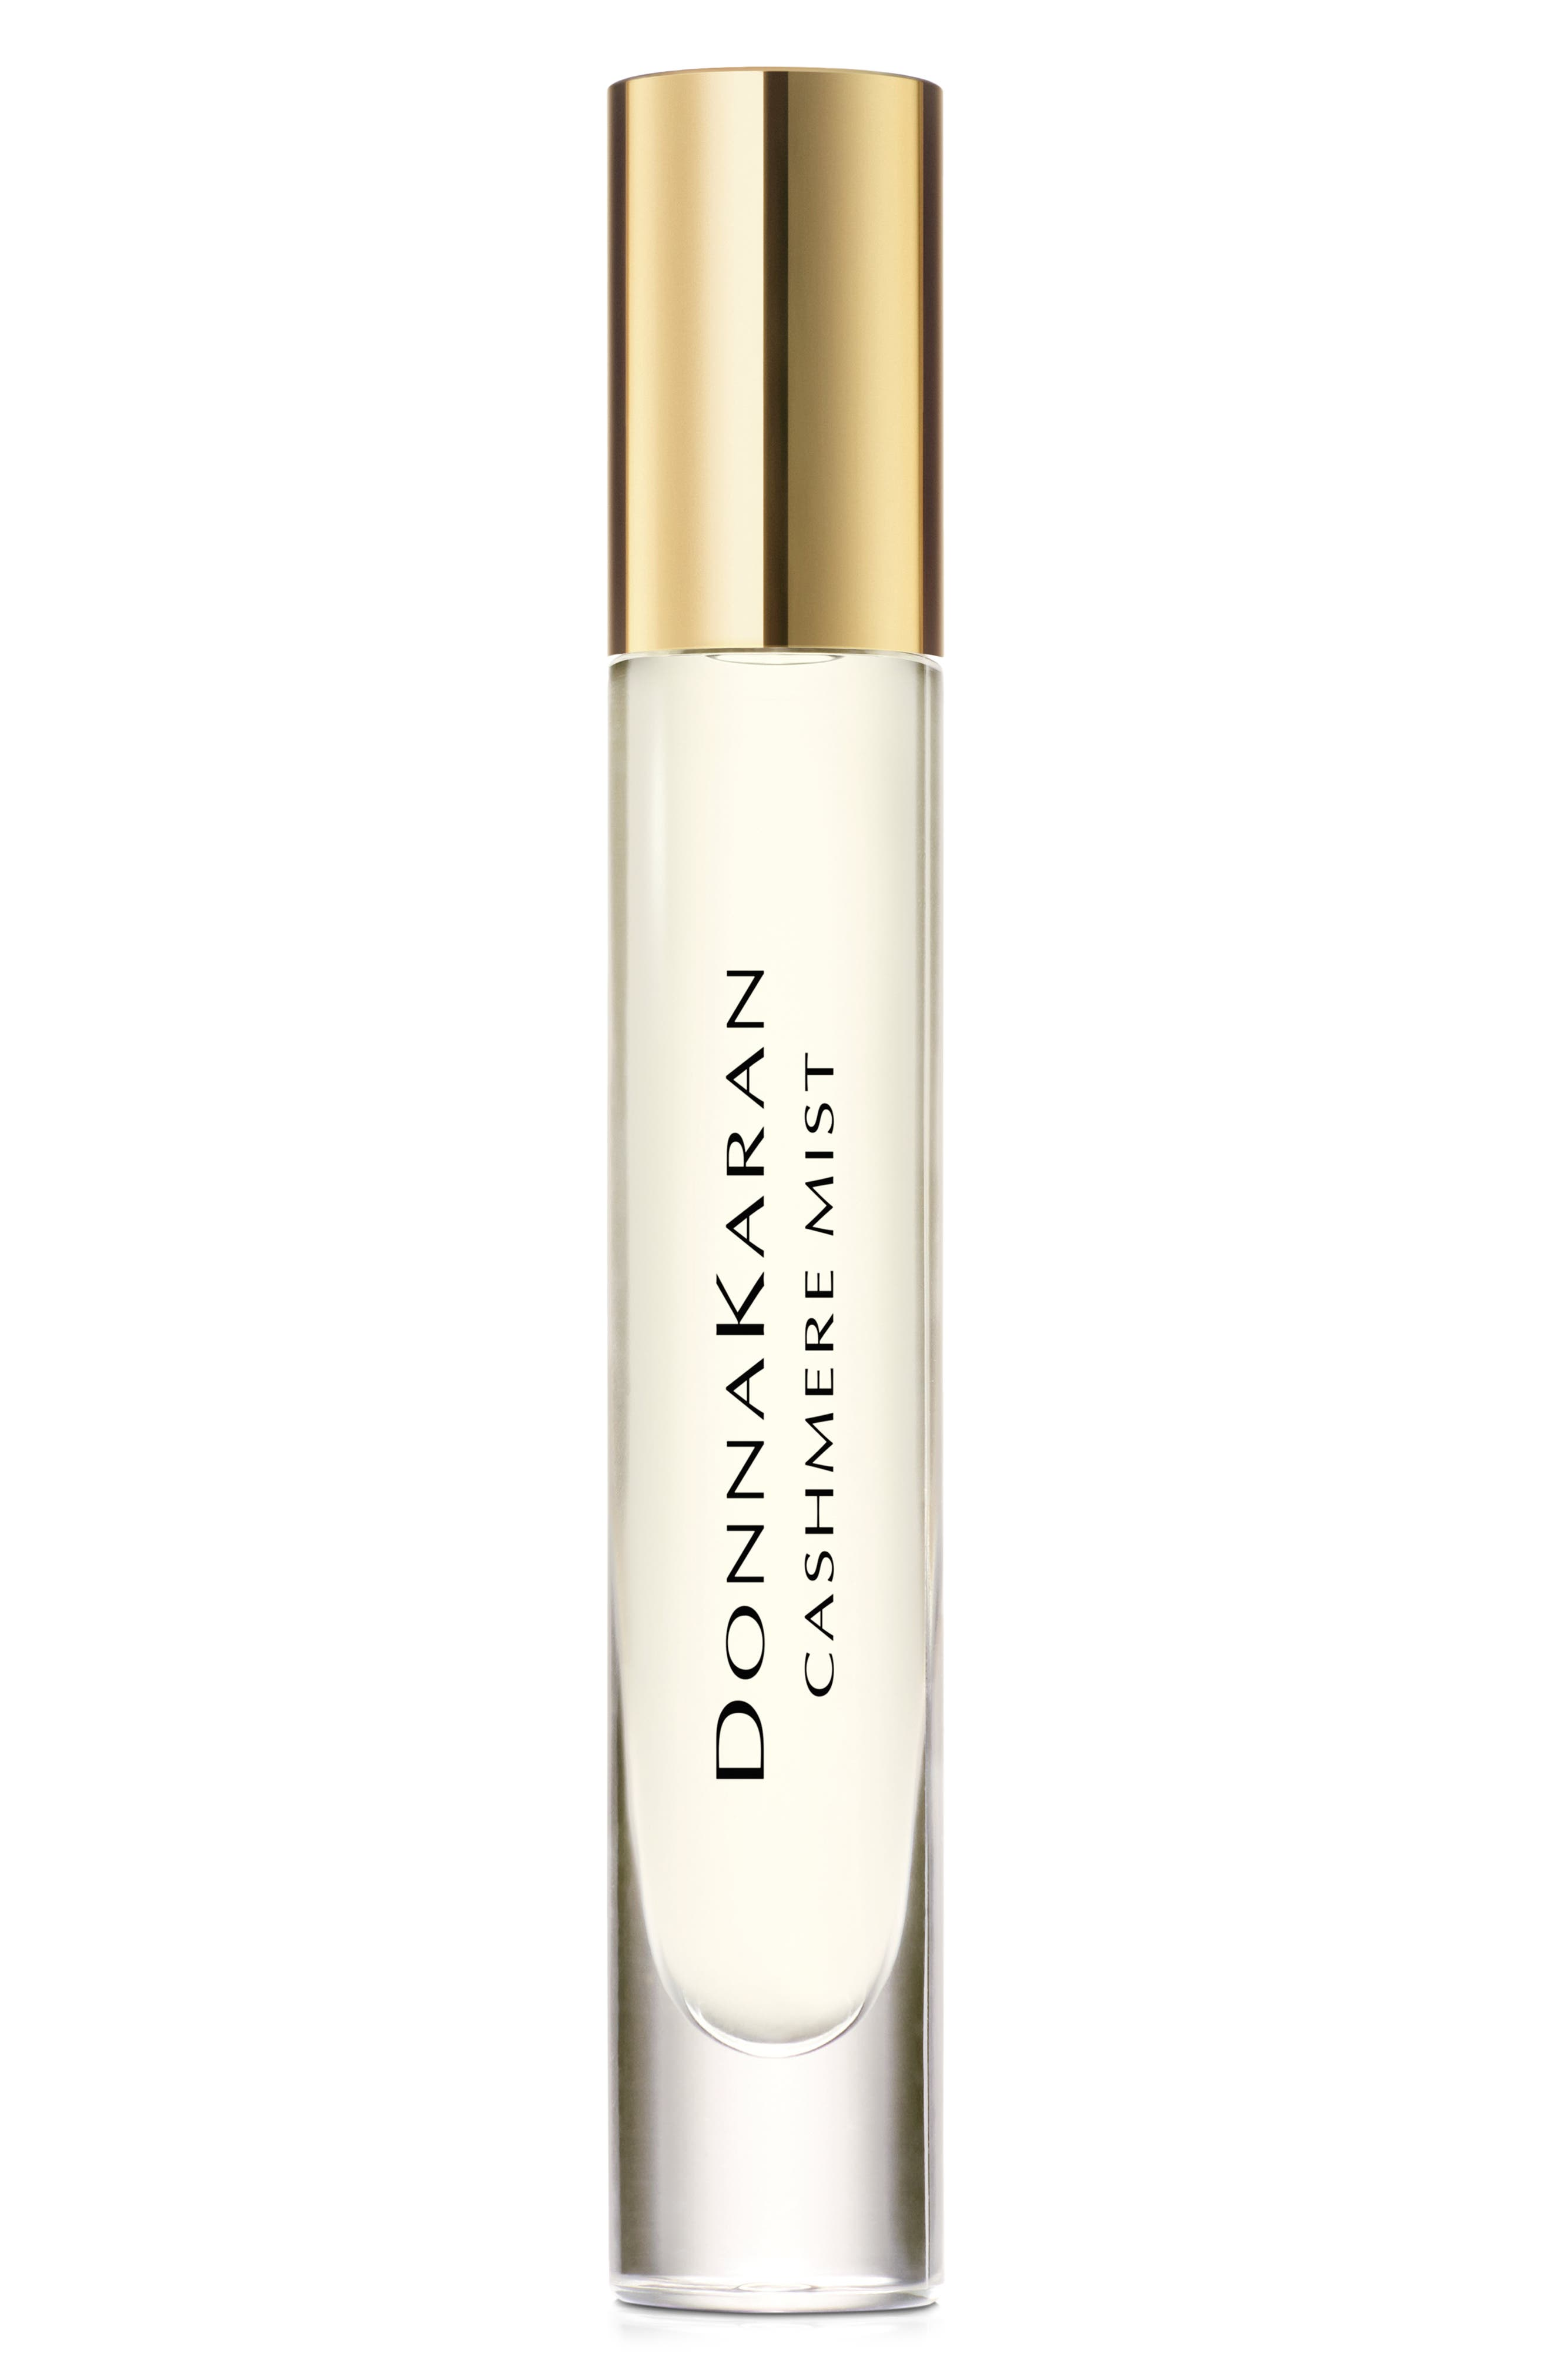 Donna Karan Cashmere Mist Eau De Parfum Purse Spray